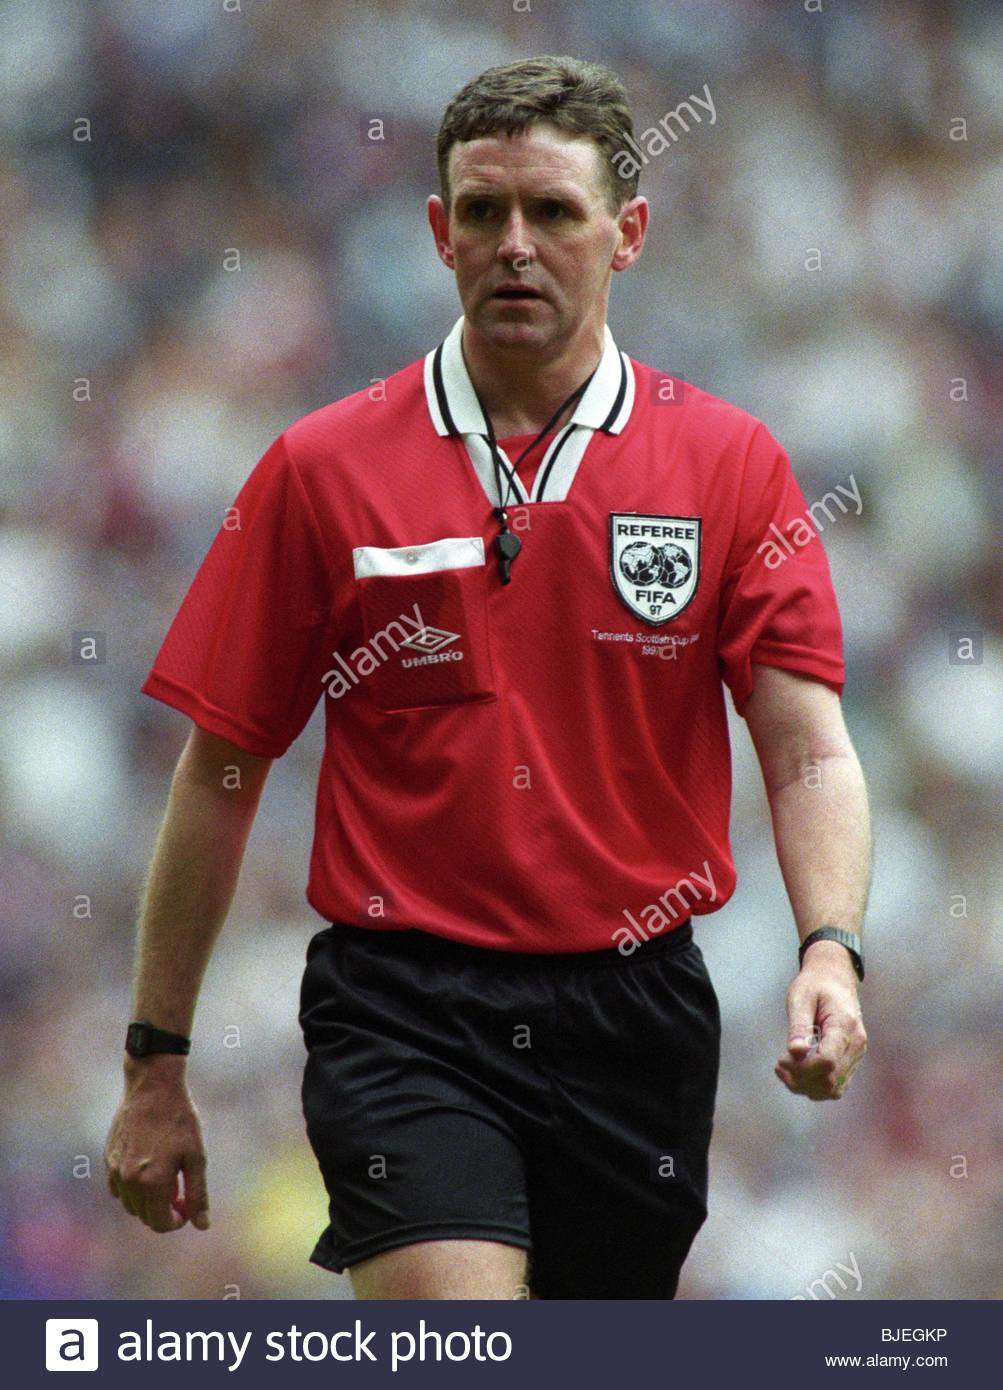 24/05/97 TENNENT'S SCOTTISH CUP FINAL KILMARNOCK V FALKIRK (1-0) IBROX - GLASGOW Referee Hugh Dallas. Stock Photo